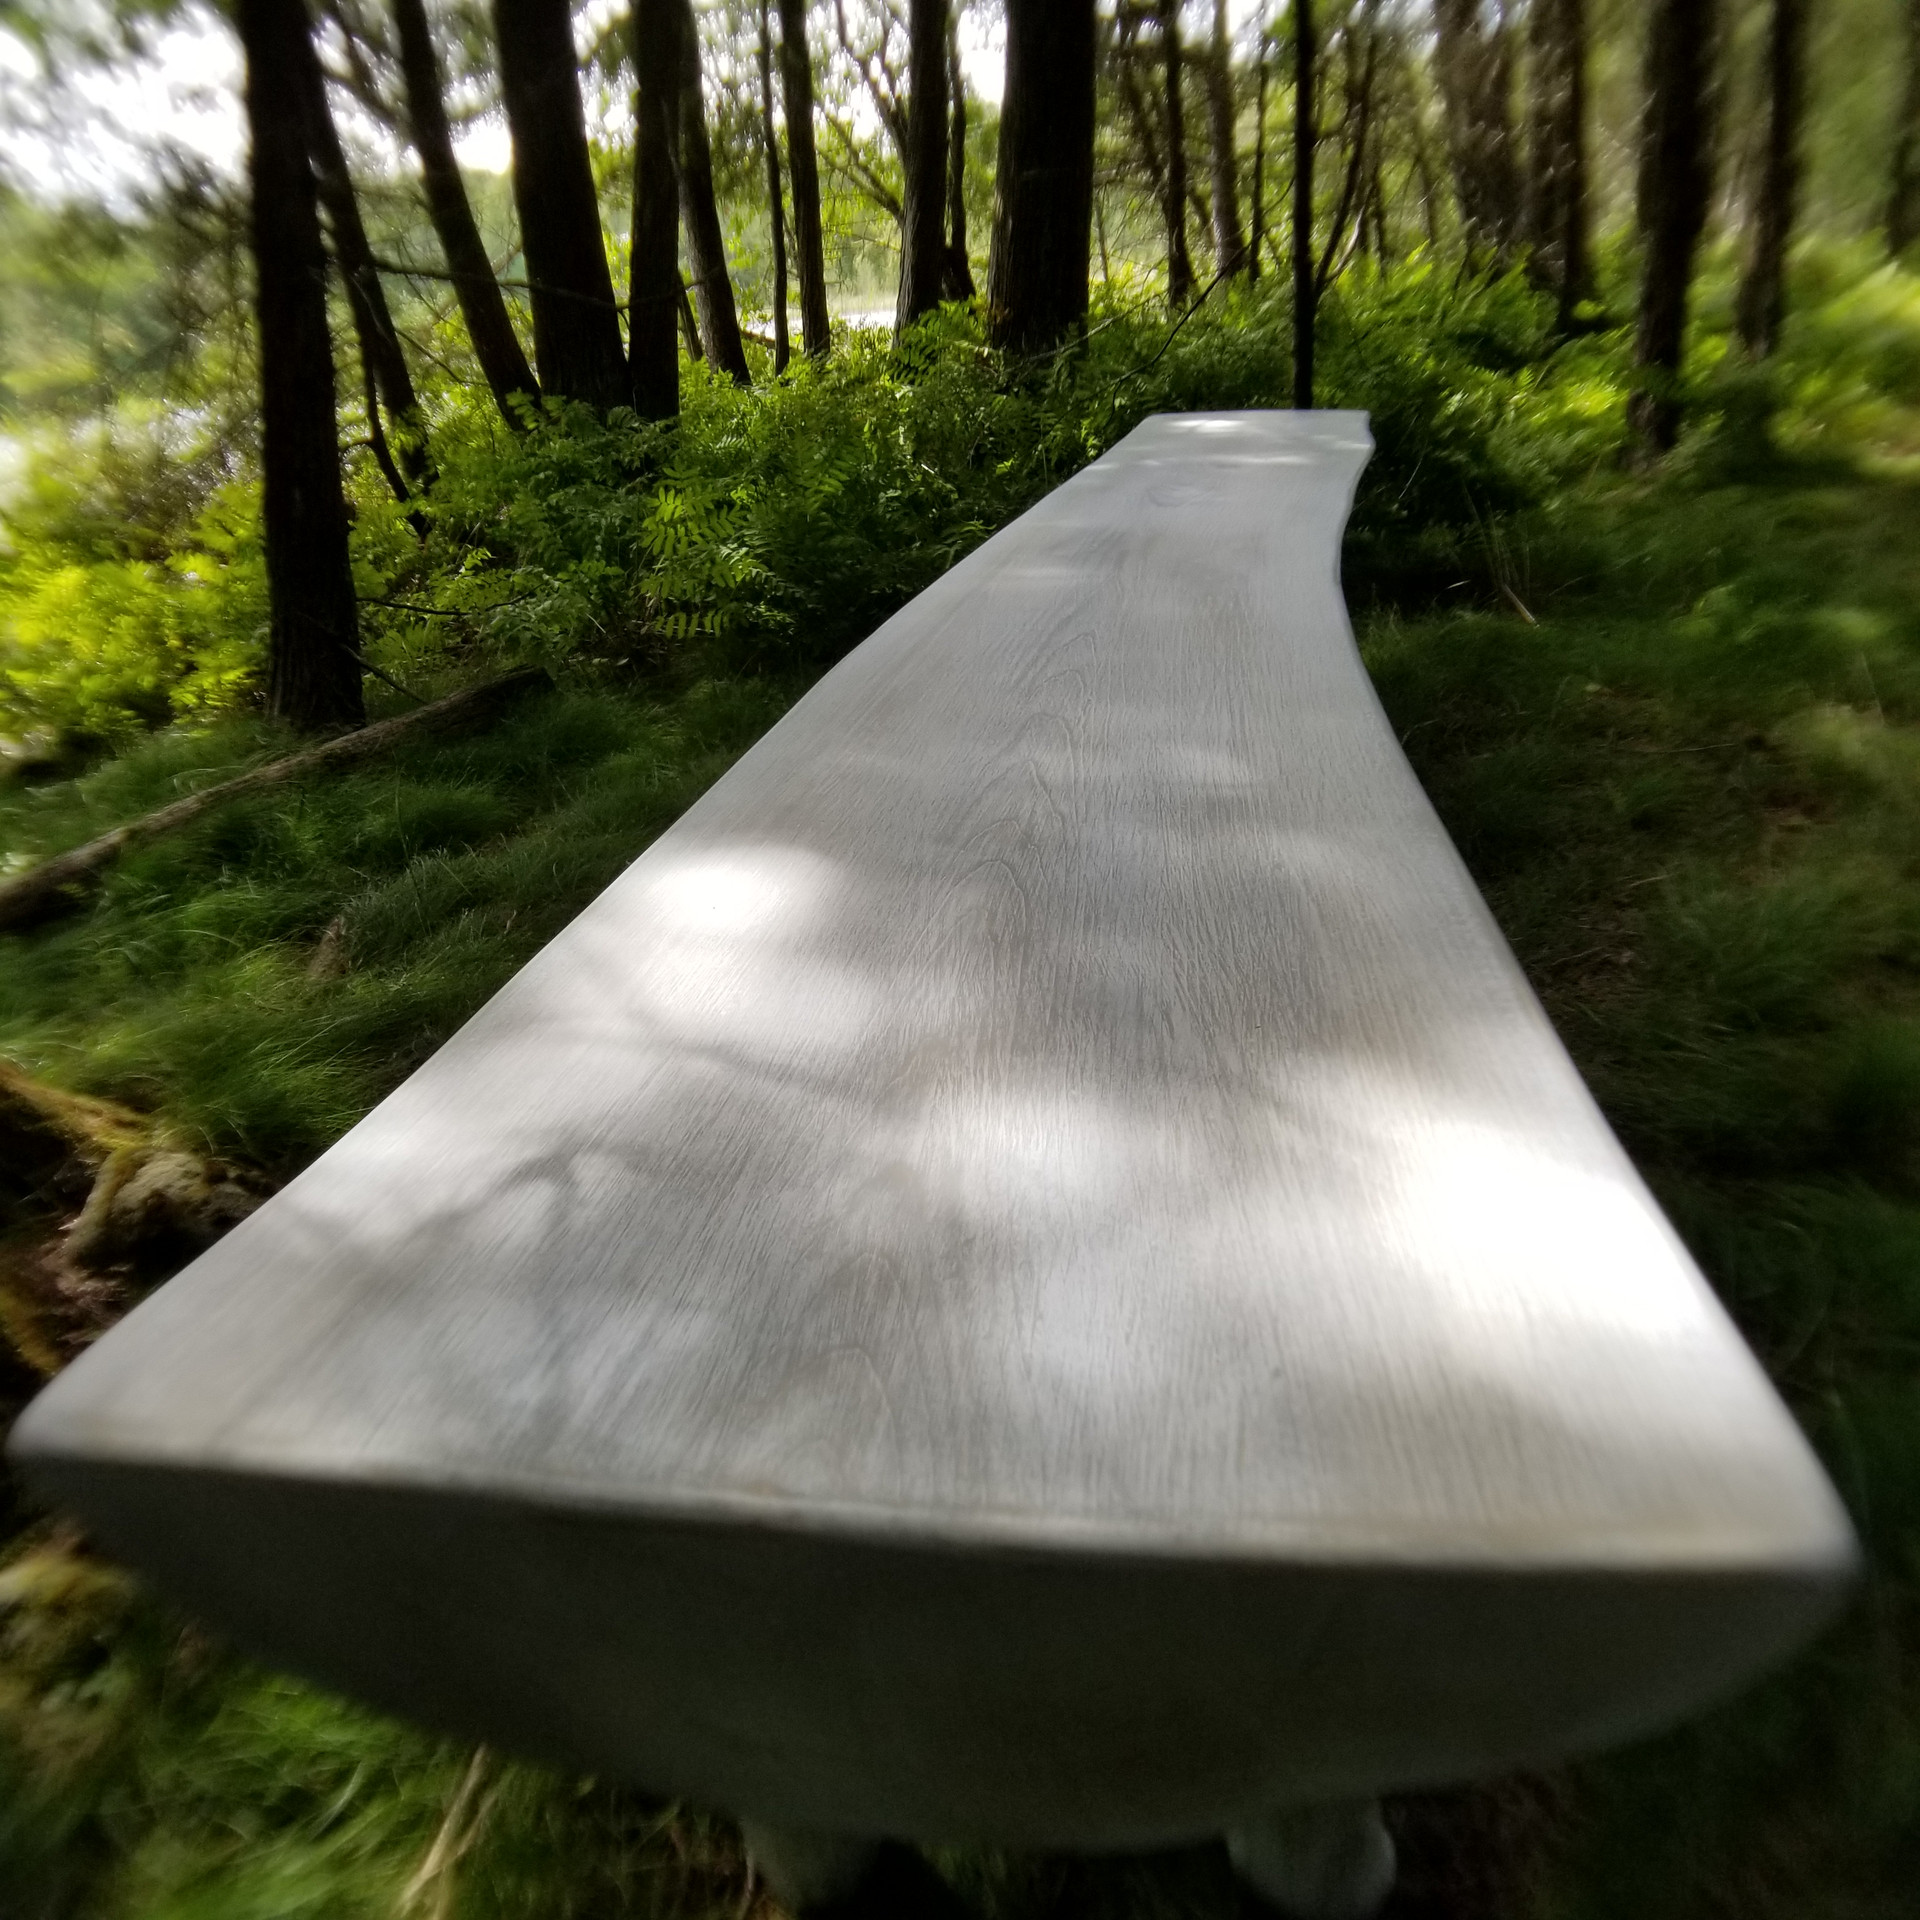 Curvy live edge and limb bench